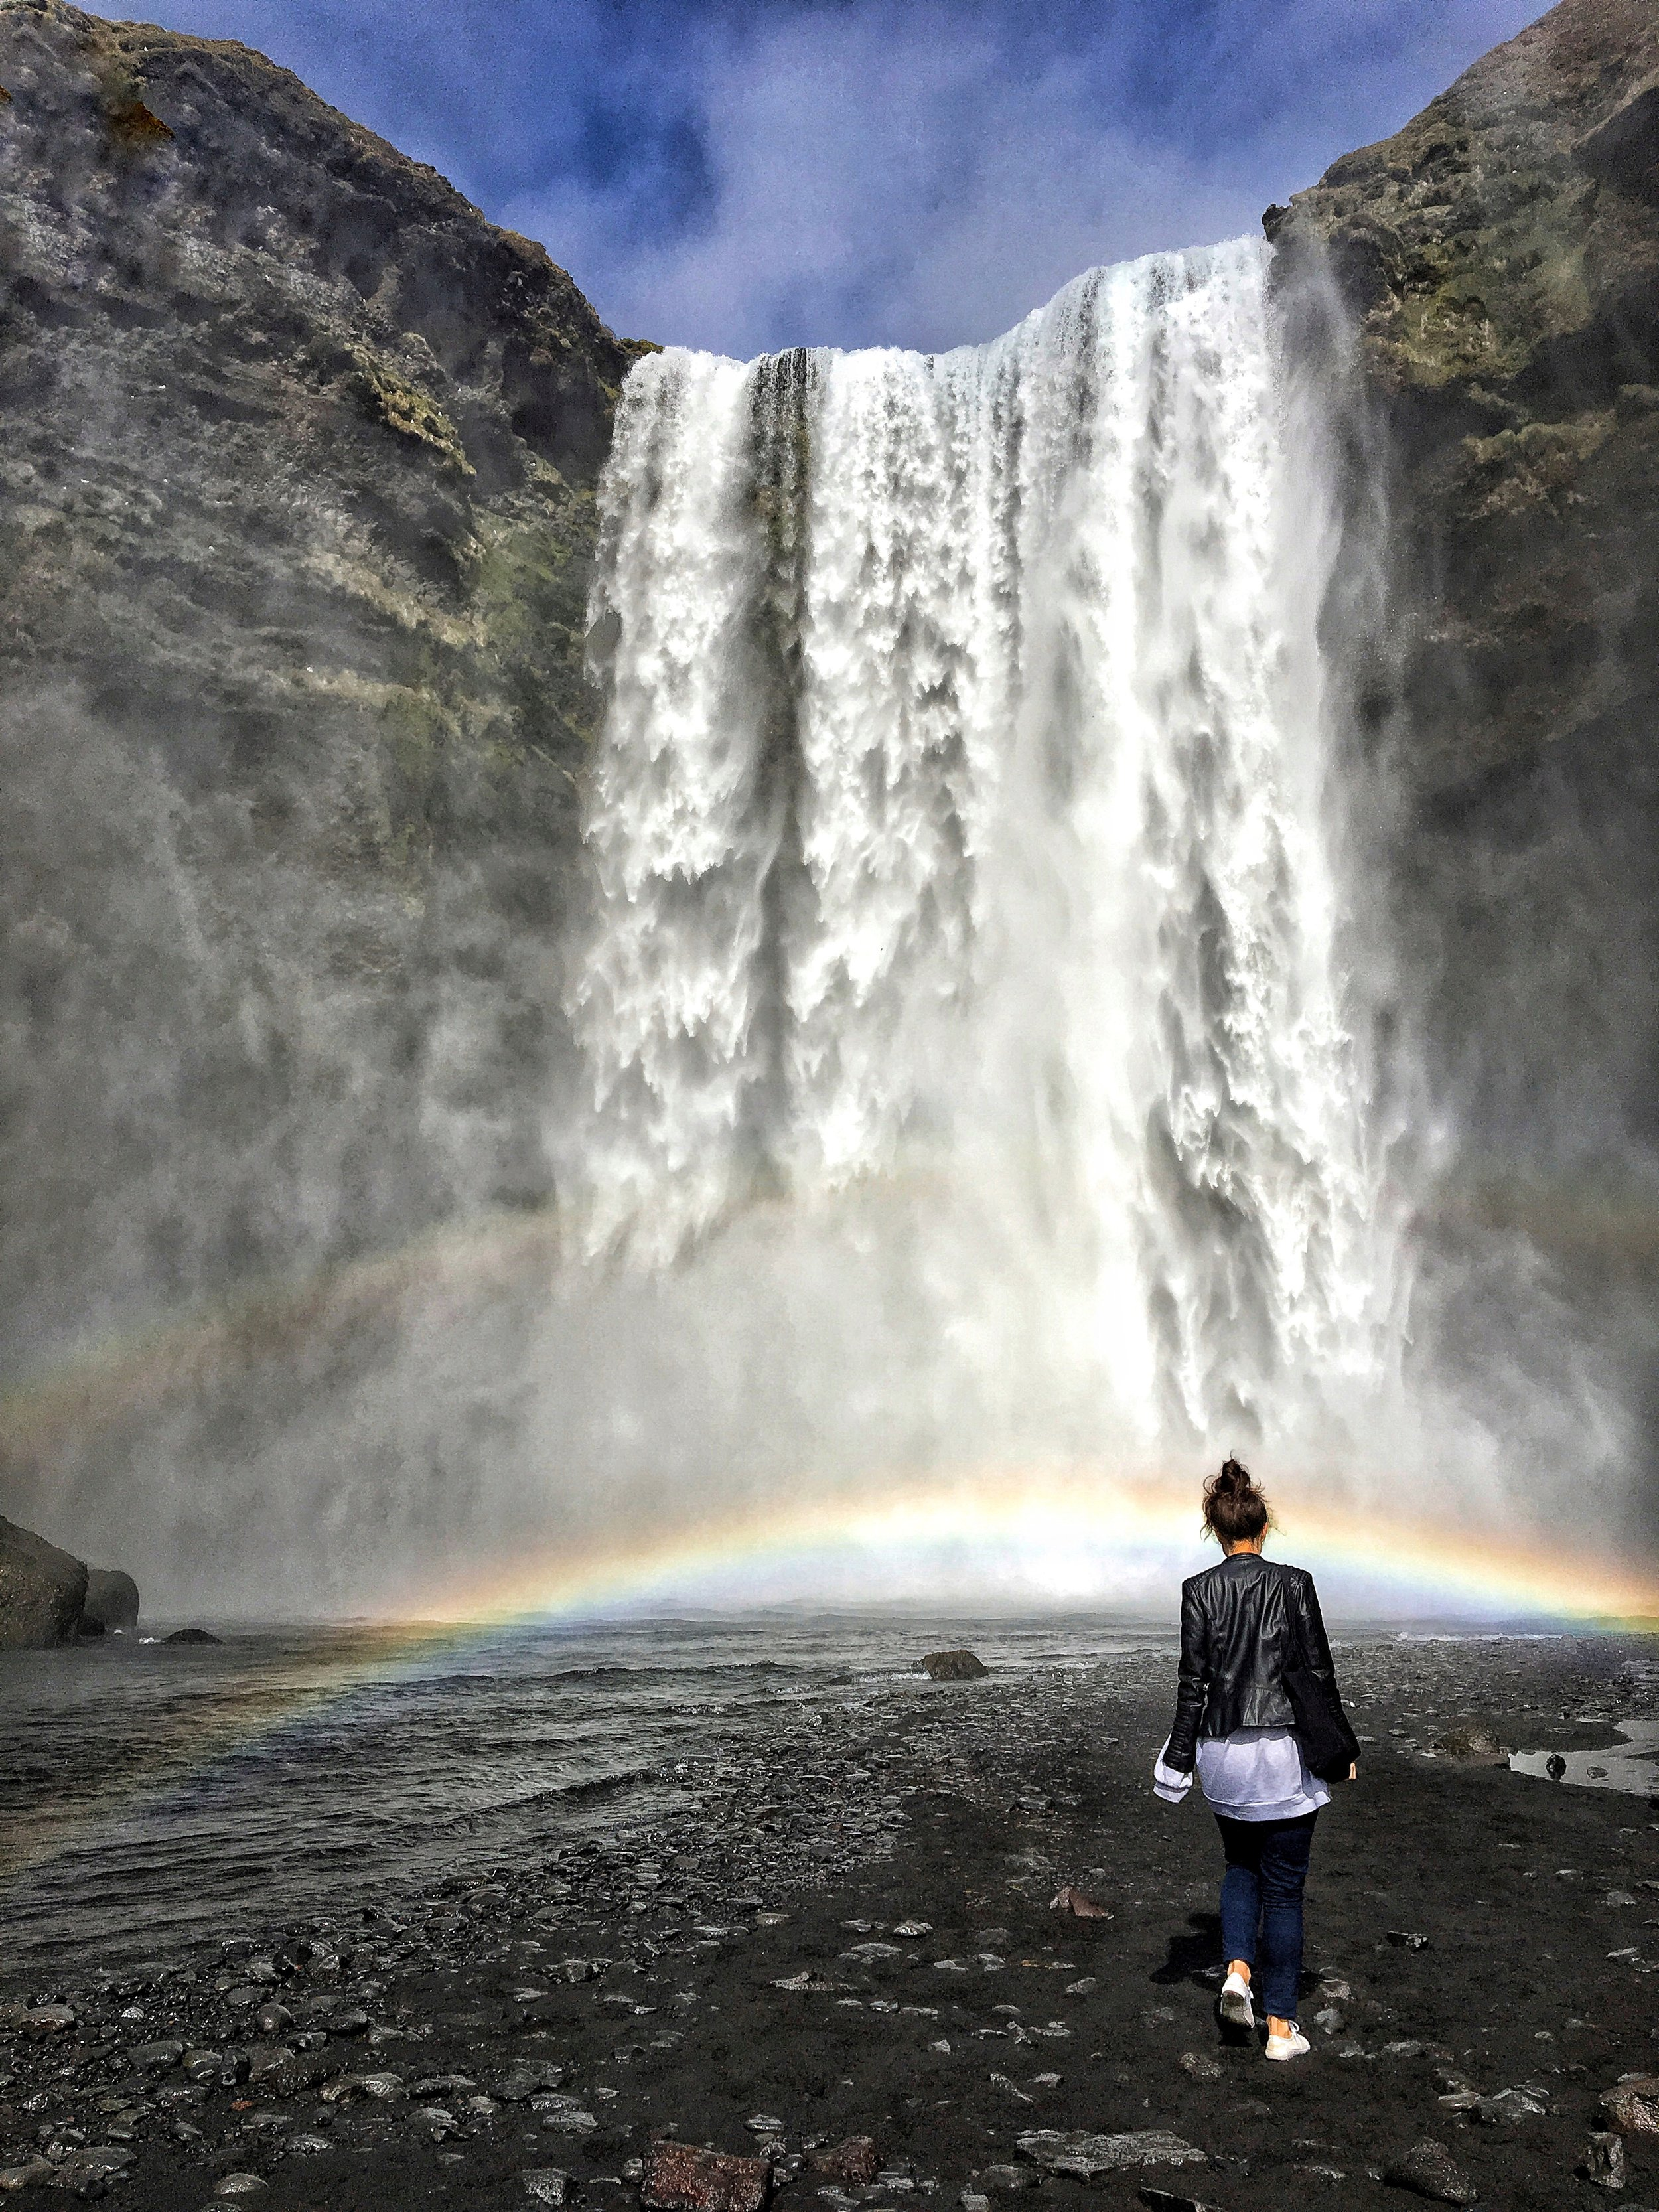 Brooklyn intimate wedding photographer + Iceland elopement photographer